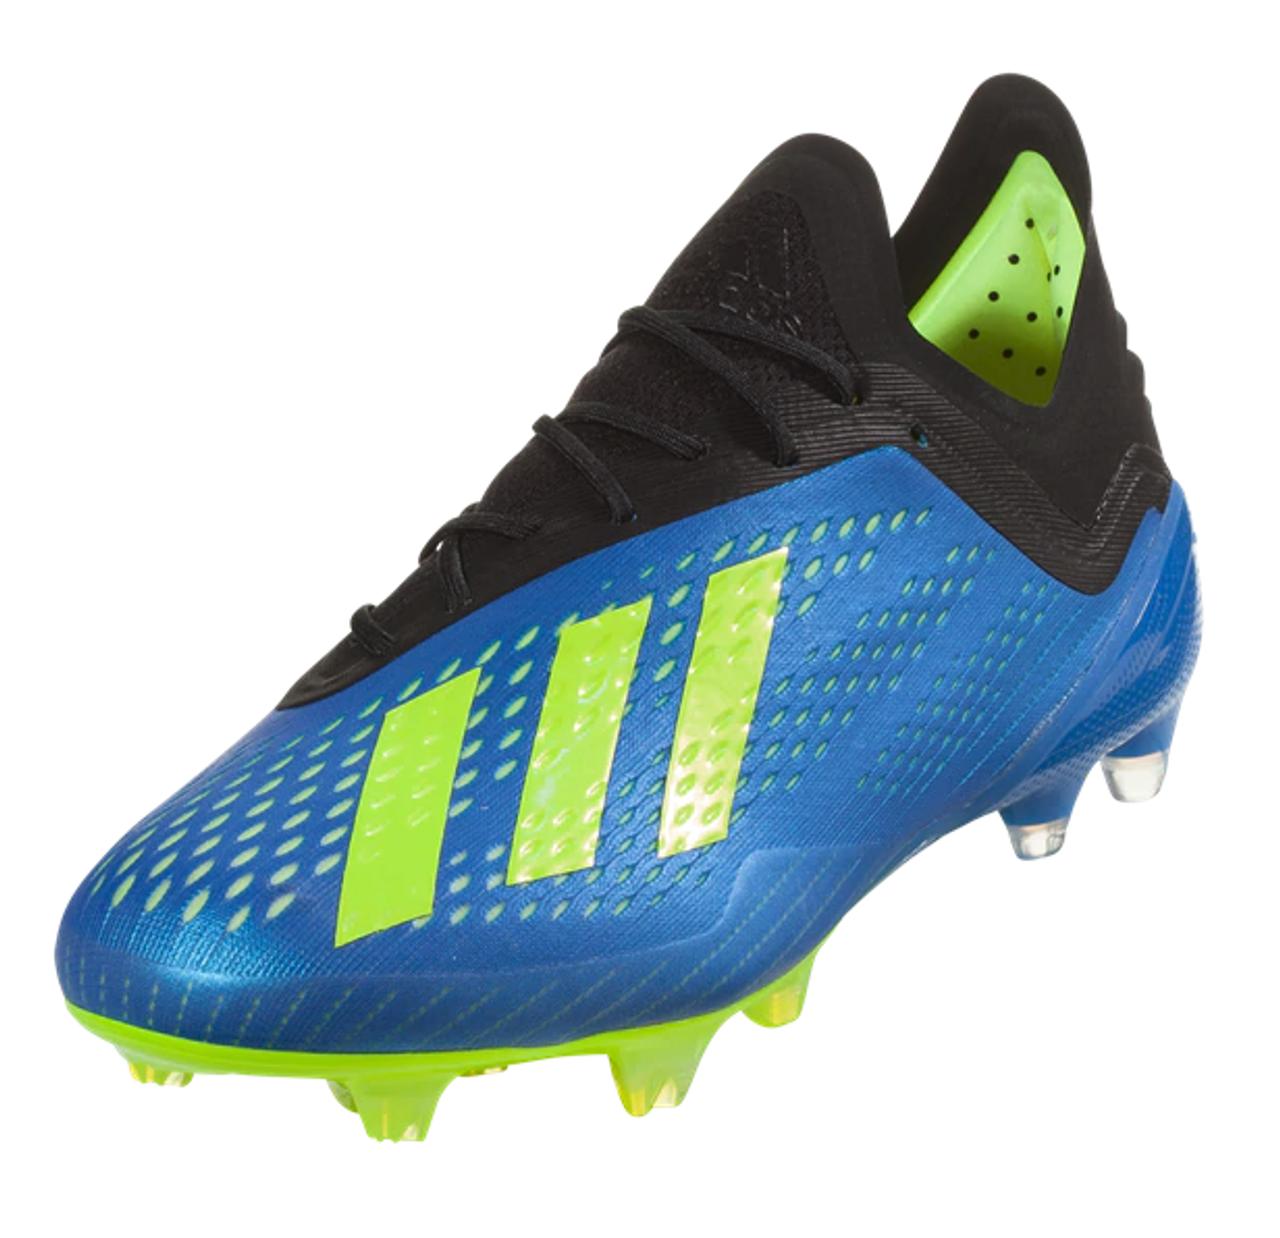 new product f6b53 1b950 Adidas X 18.1 FG - Football Blue Solar Yellow Core Black RC (110718) -  Cheap Nike Football Boots Sale